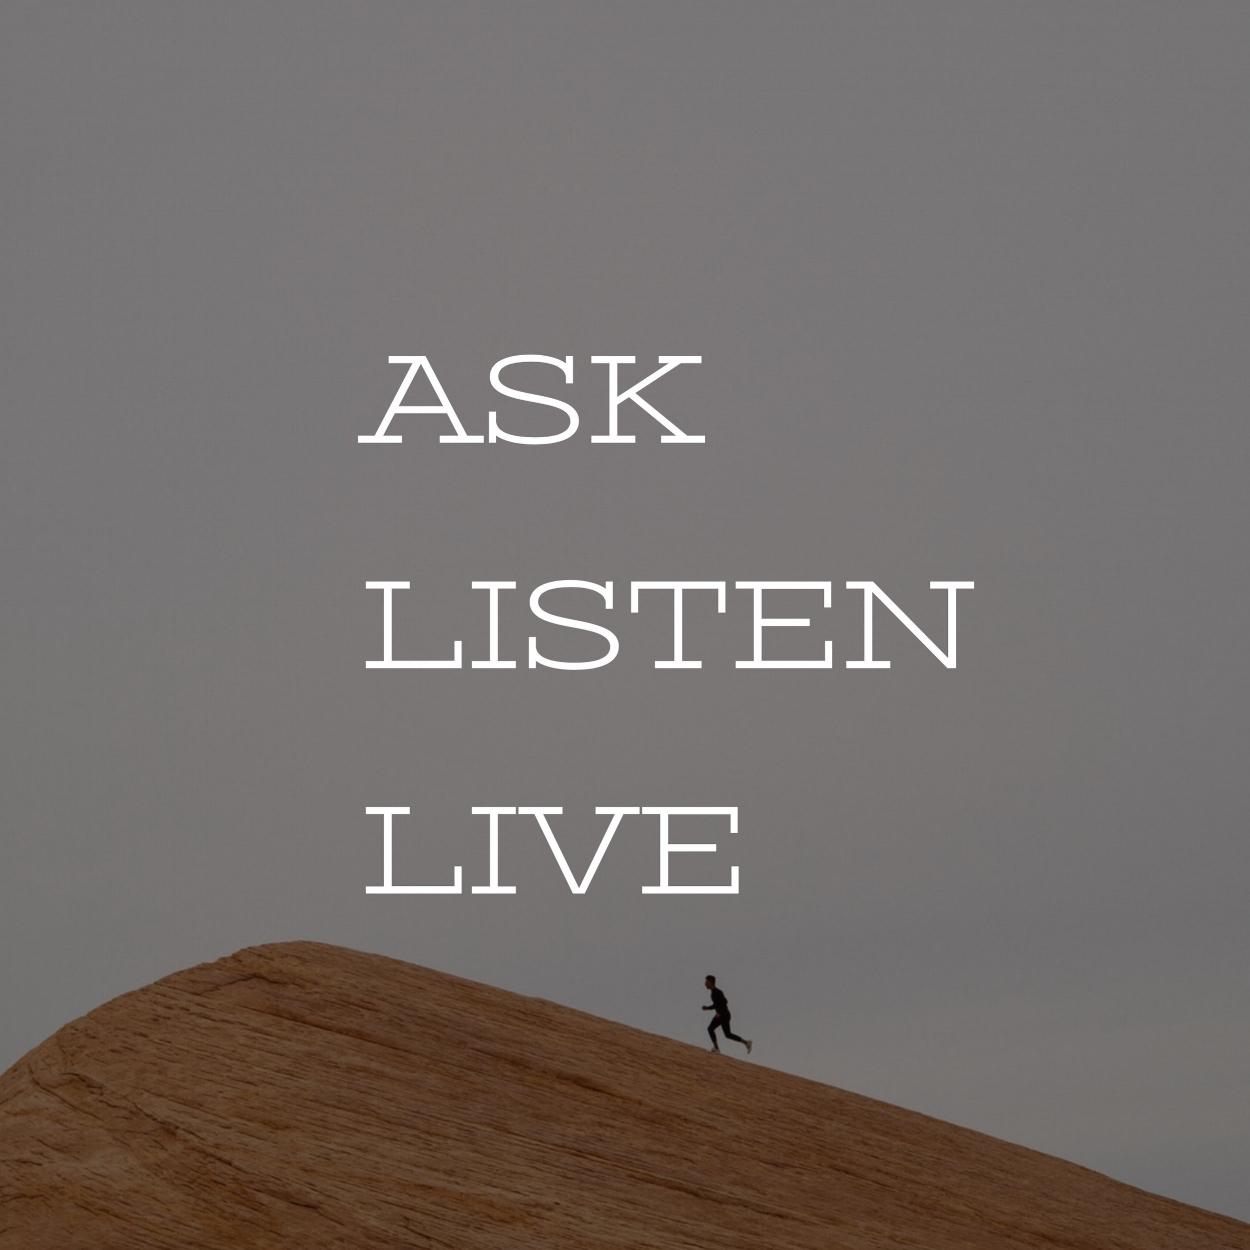 ASK LISTEN LIVE.jpg